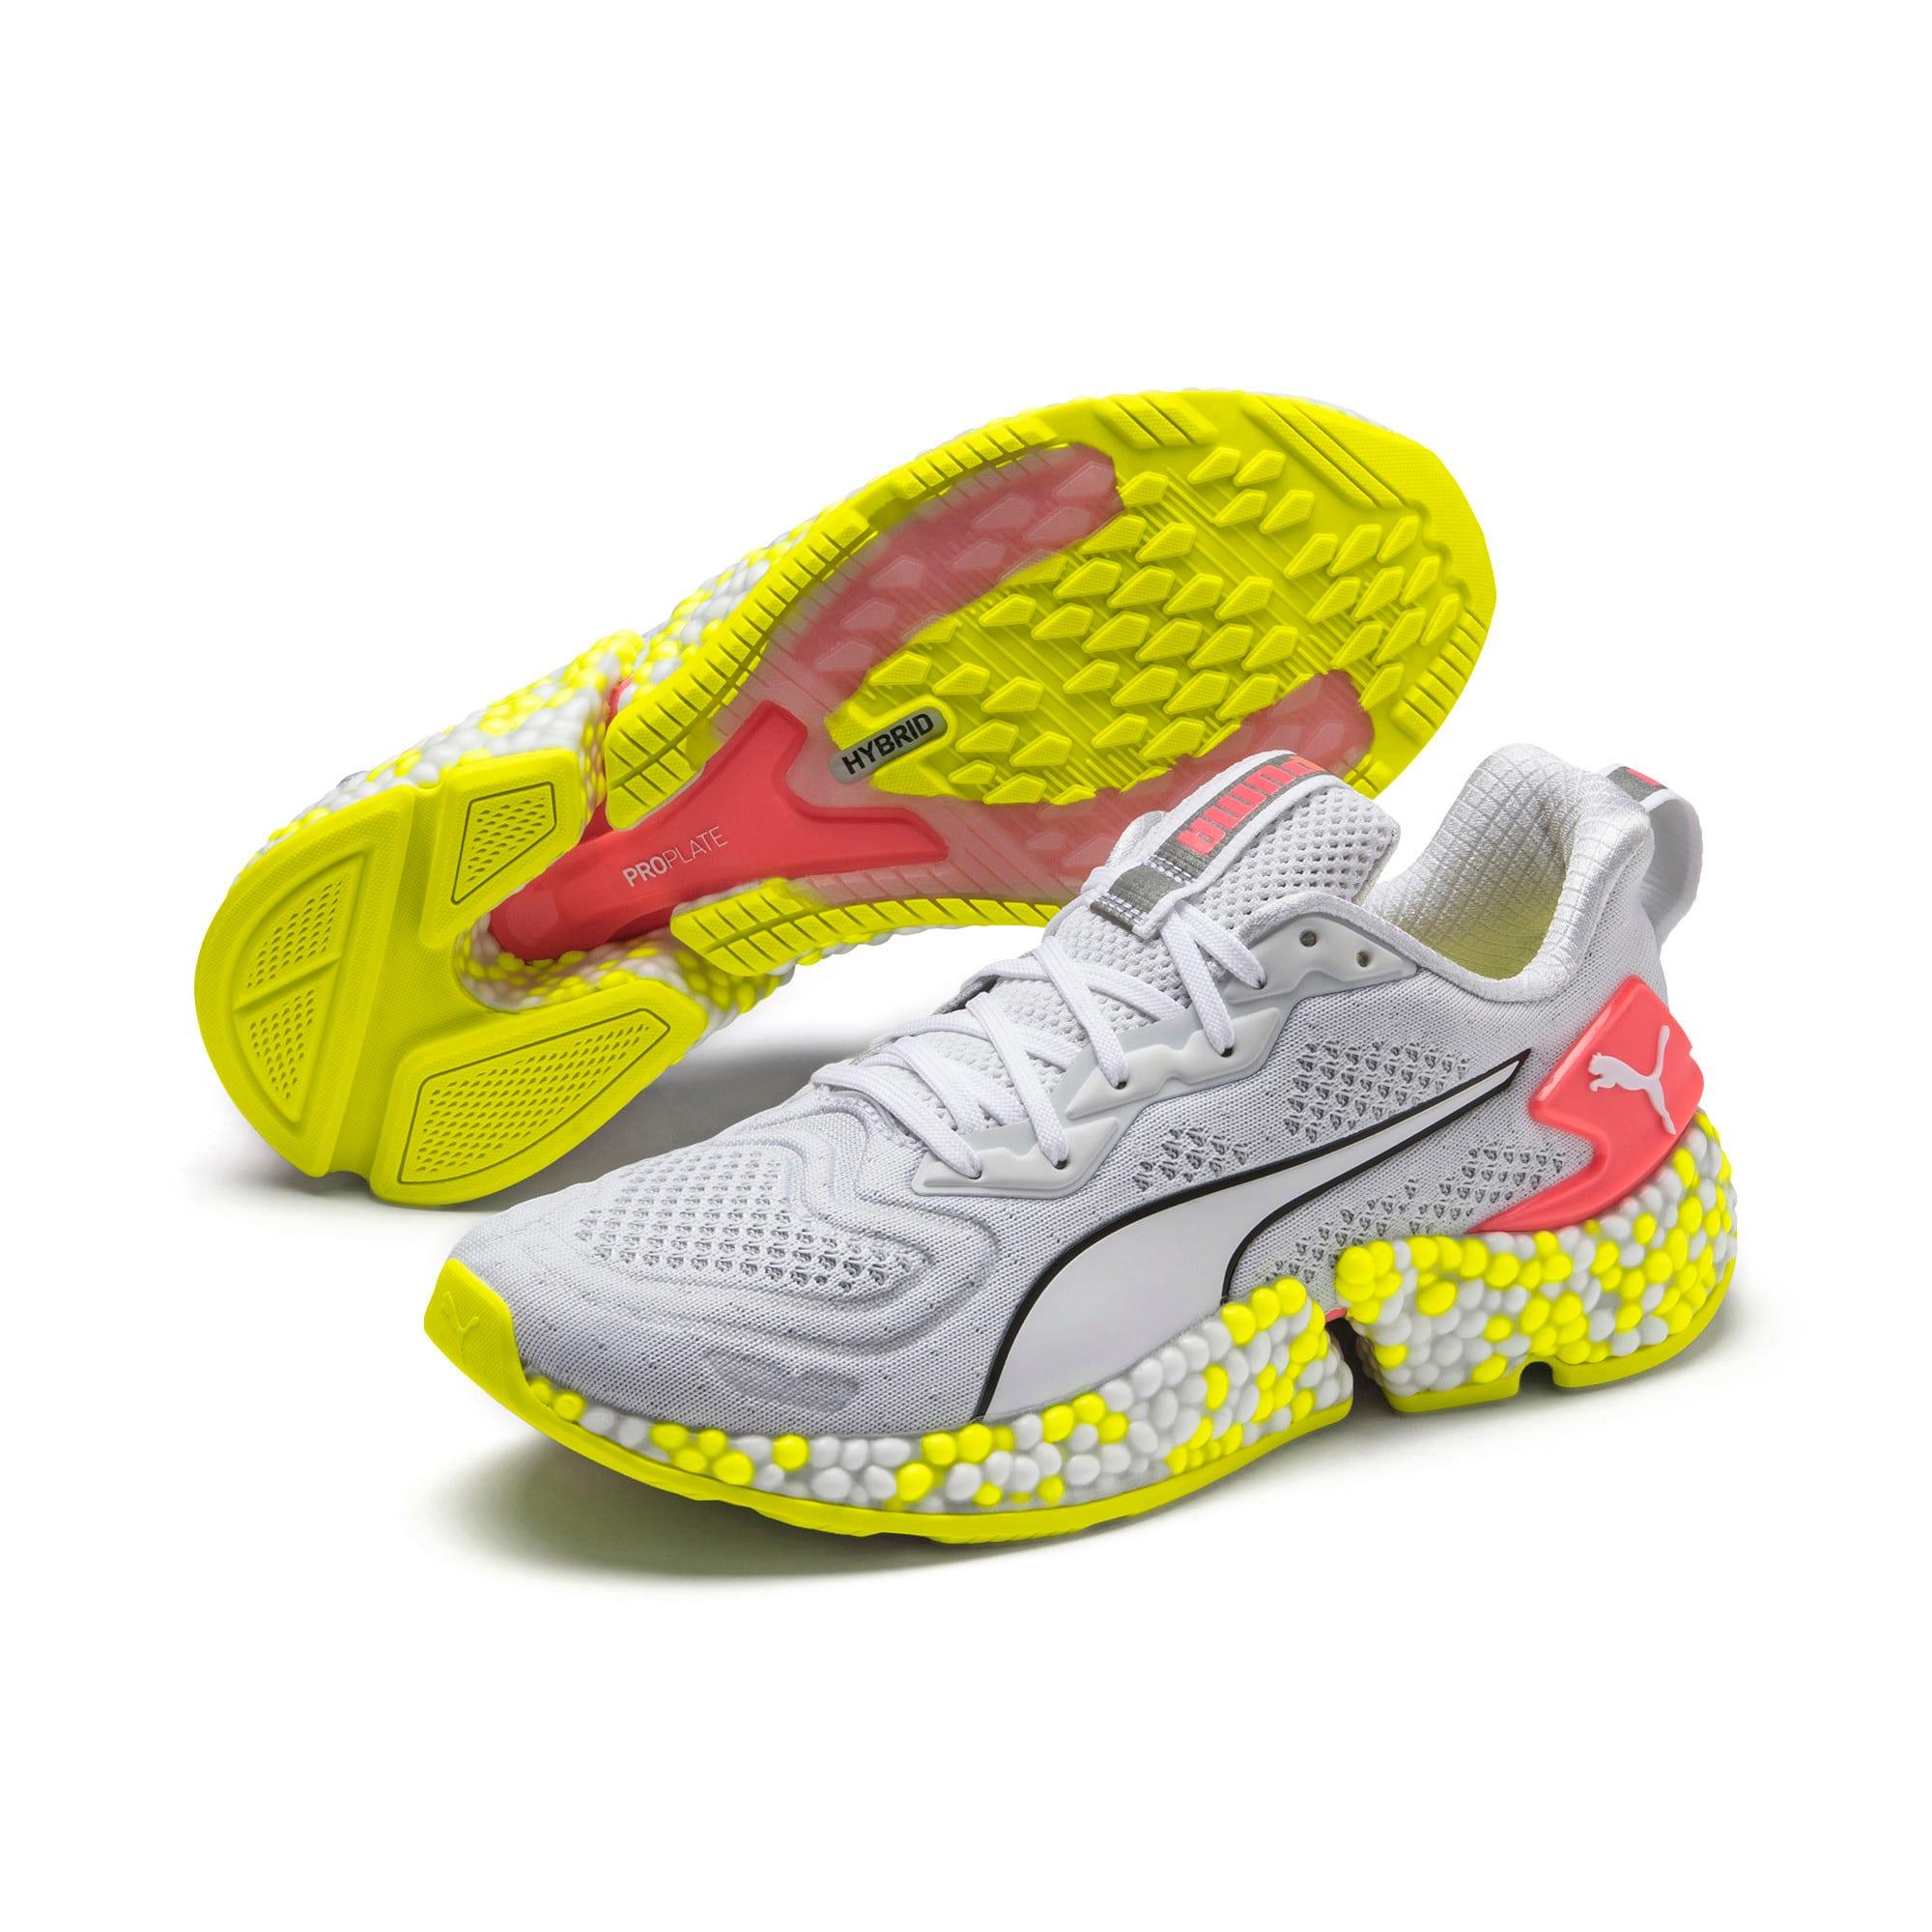 Thumbnail 3 of HYBRID SPEED Orbiter Women's Running Shoes, Puma White-Yellow Alert, medium